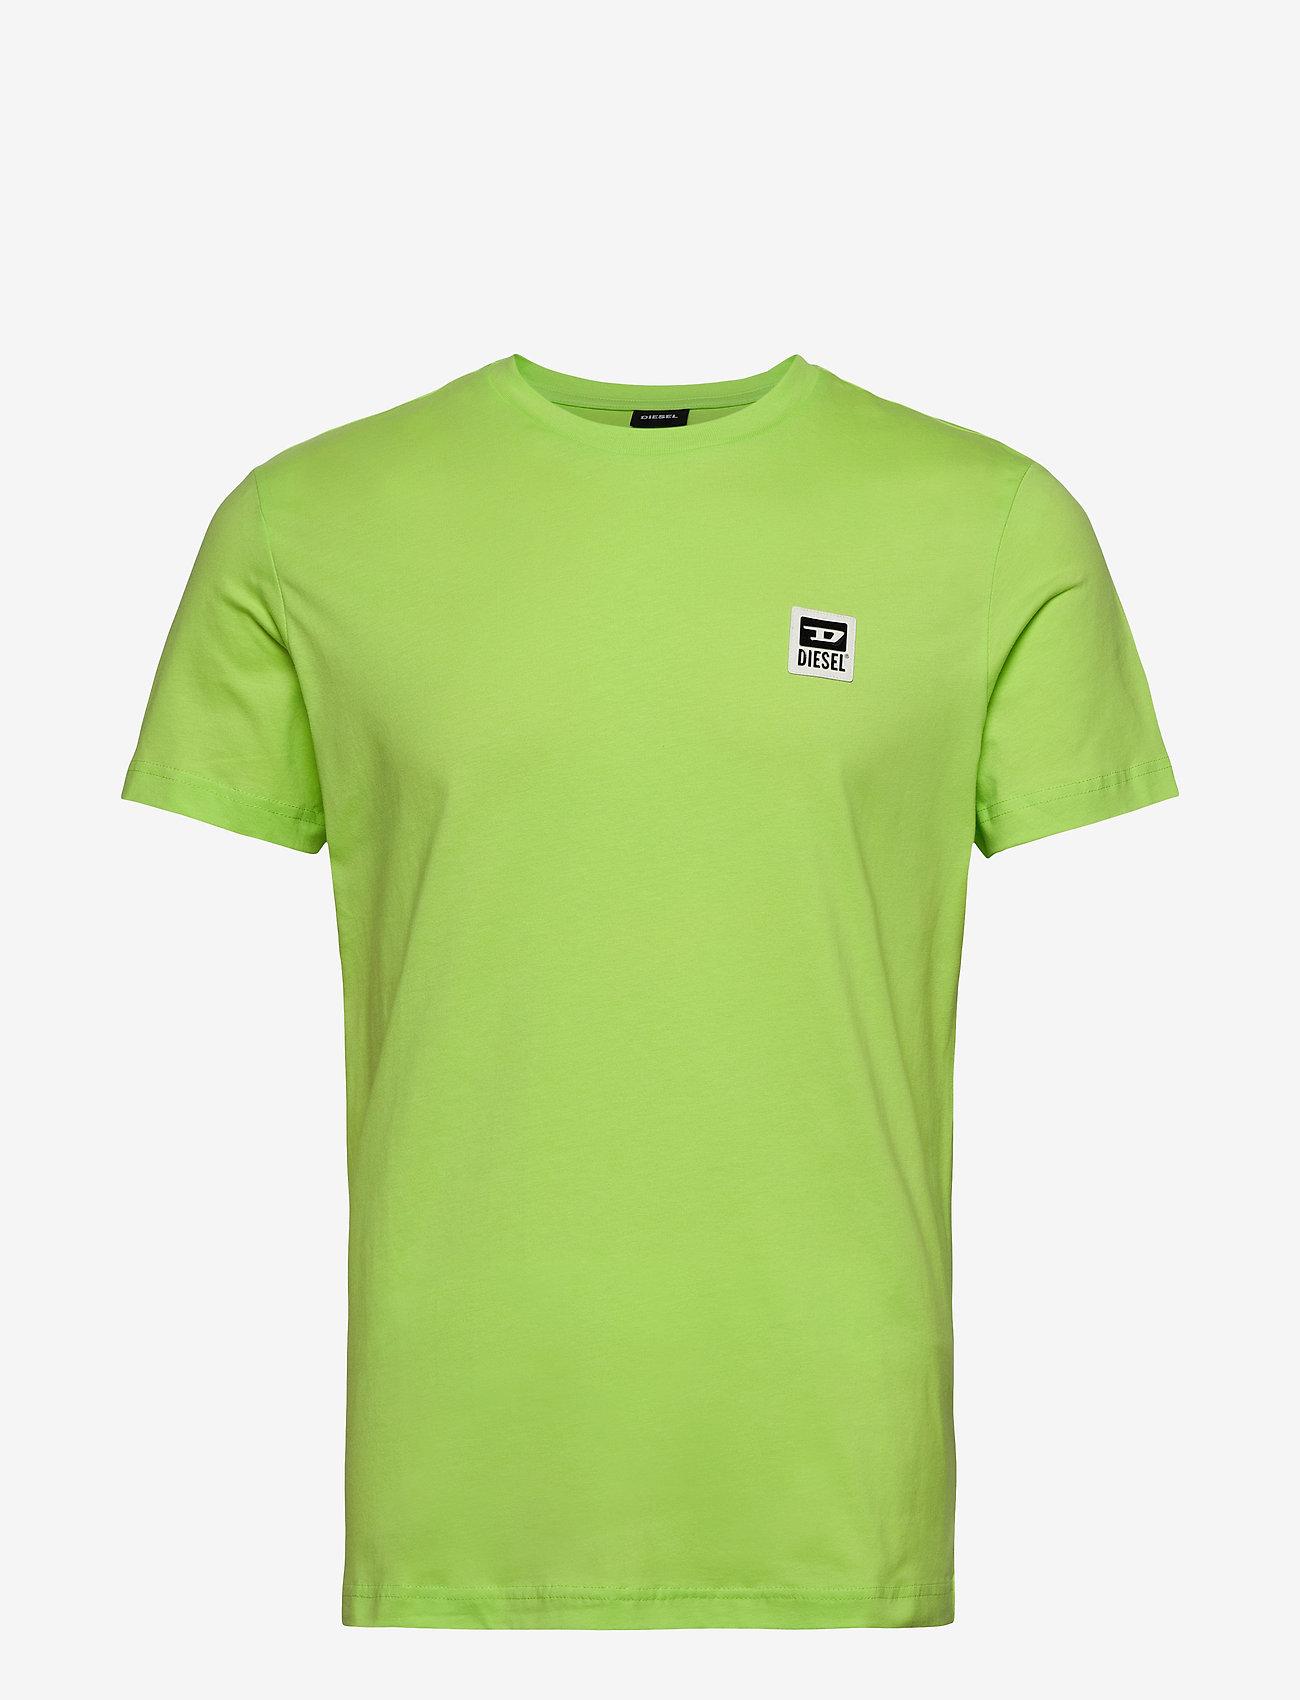 Diesel Men - T-DIEGOS-K30 T-SHIRT - basic t-shirts - lime green fluo - 0